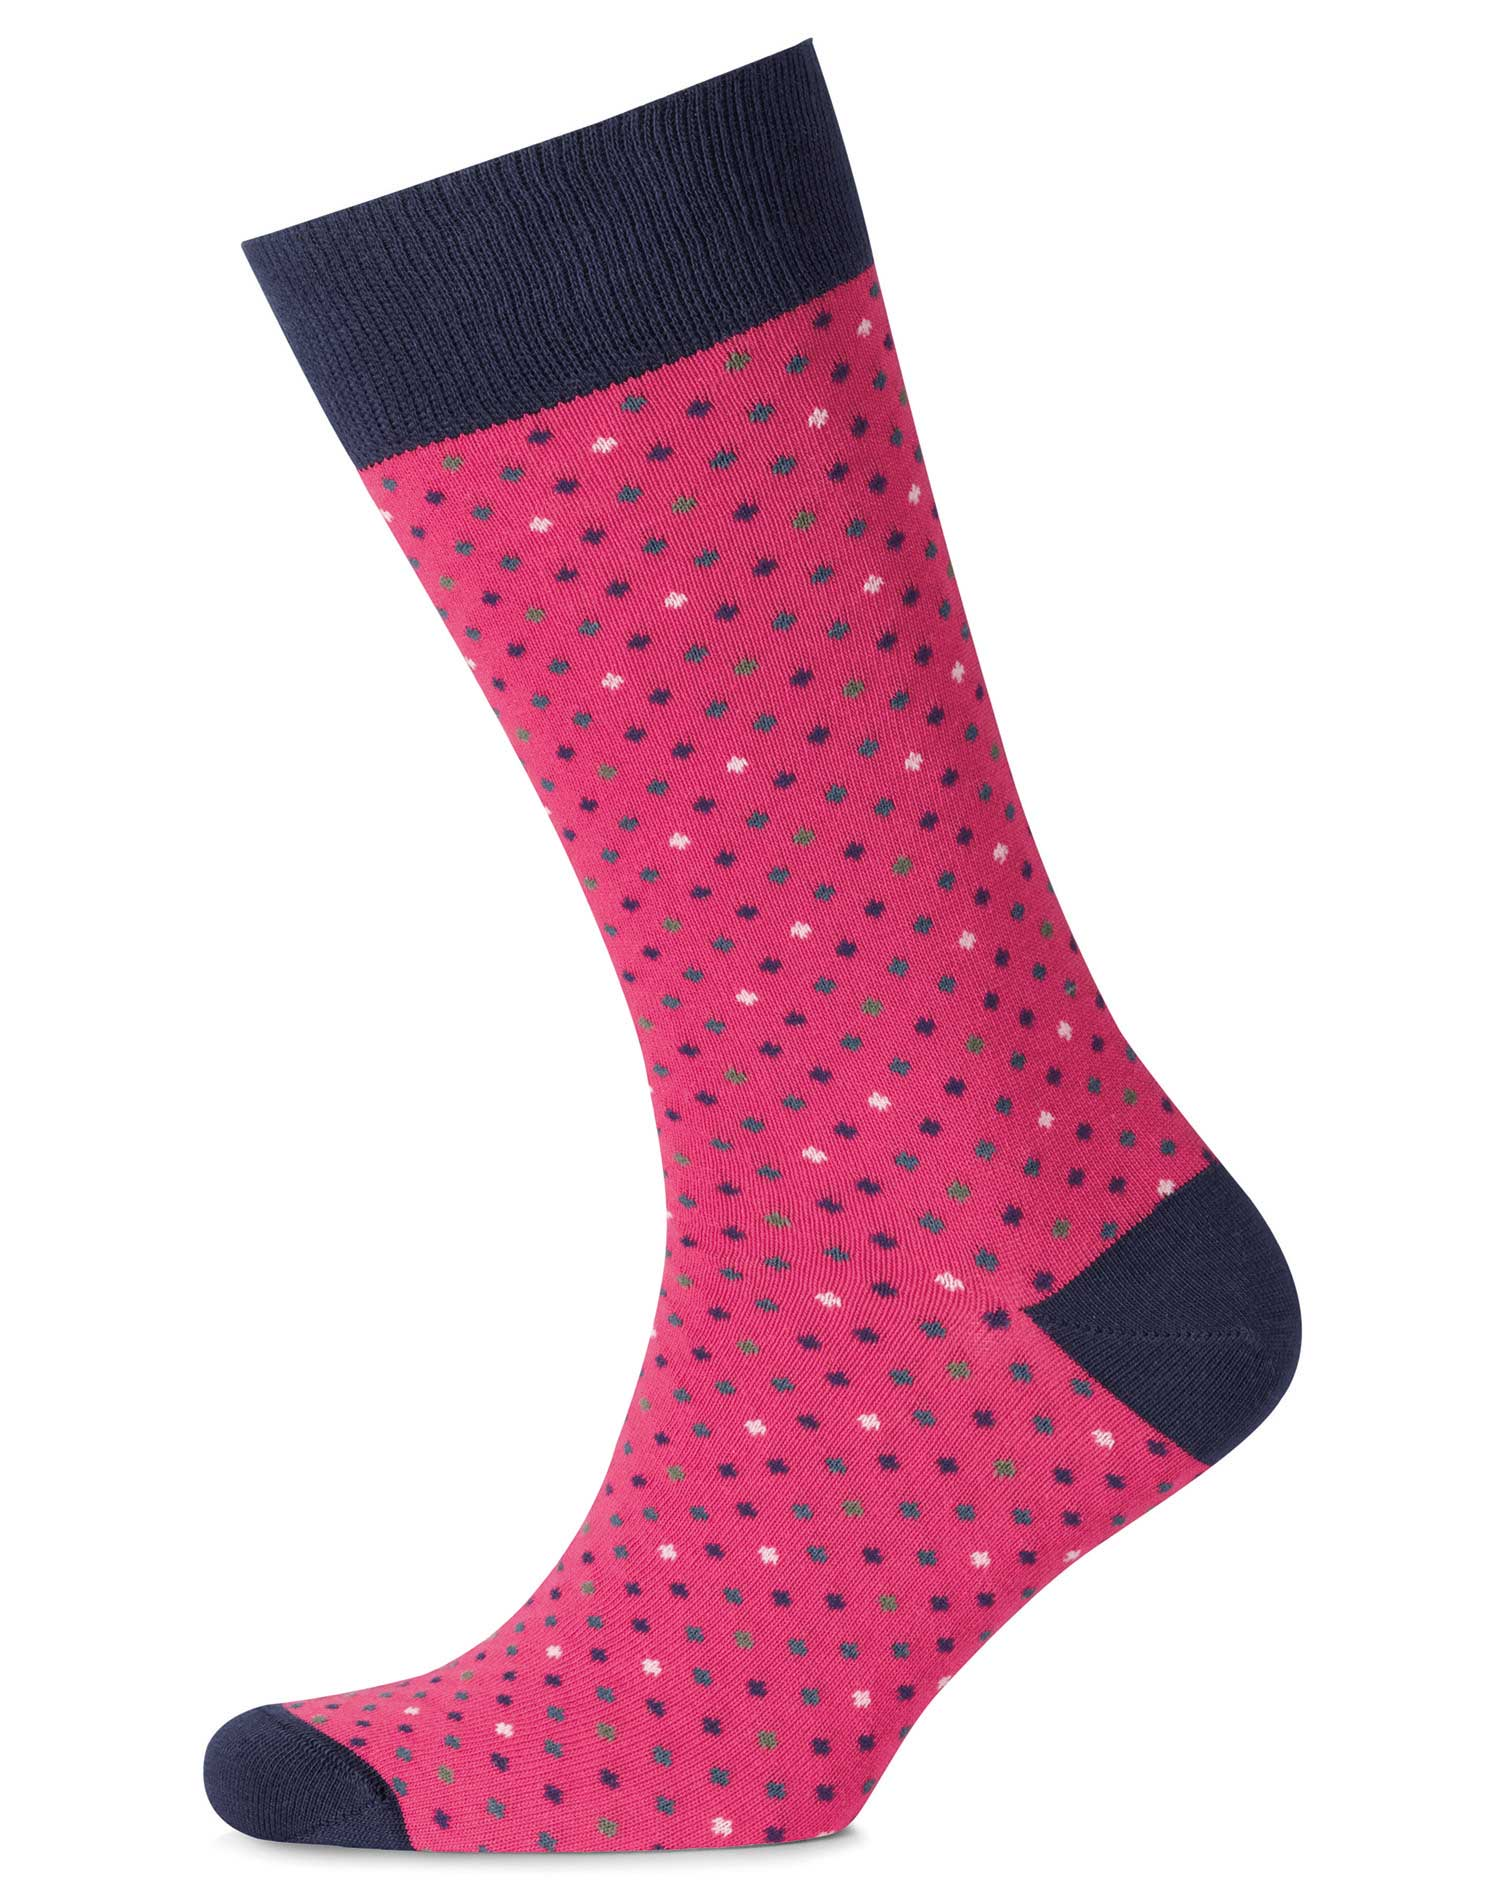 Pink Multi Dot Socks Size Large by Charles Tyrwhitt